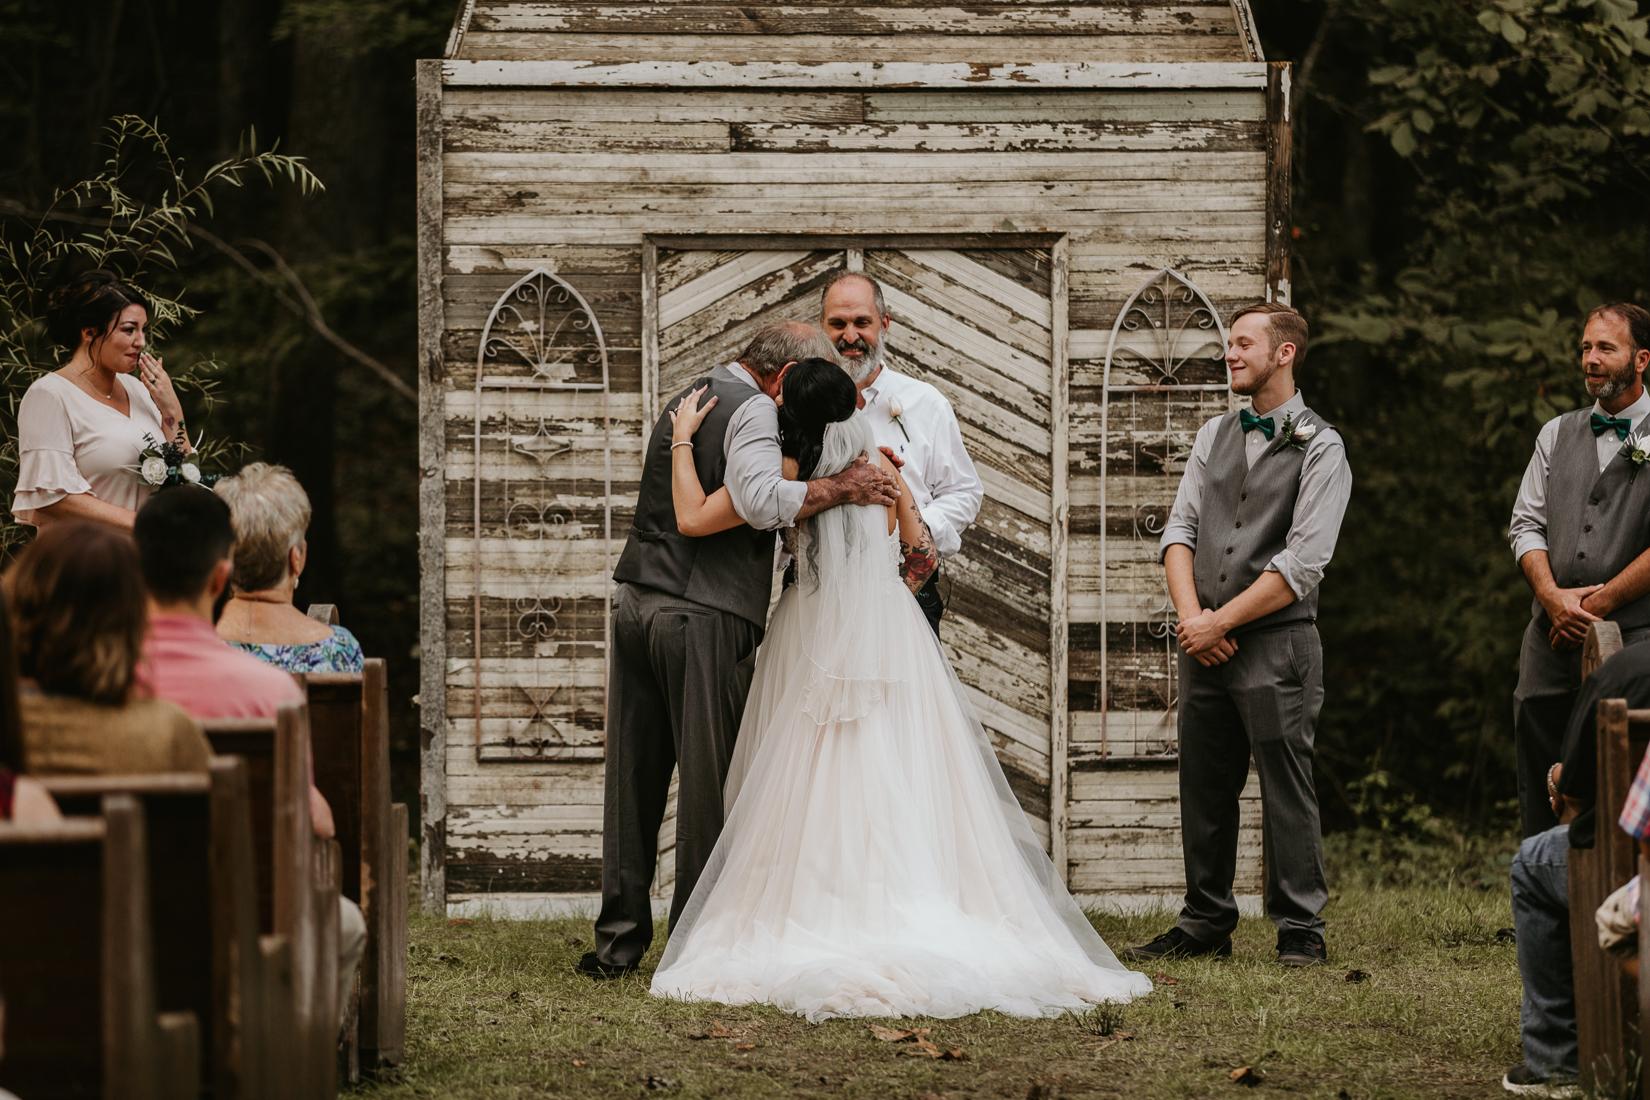 olivia_zay_wedding_09_2018-9634.jpg